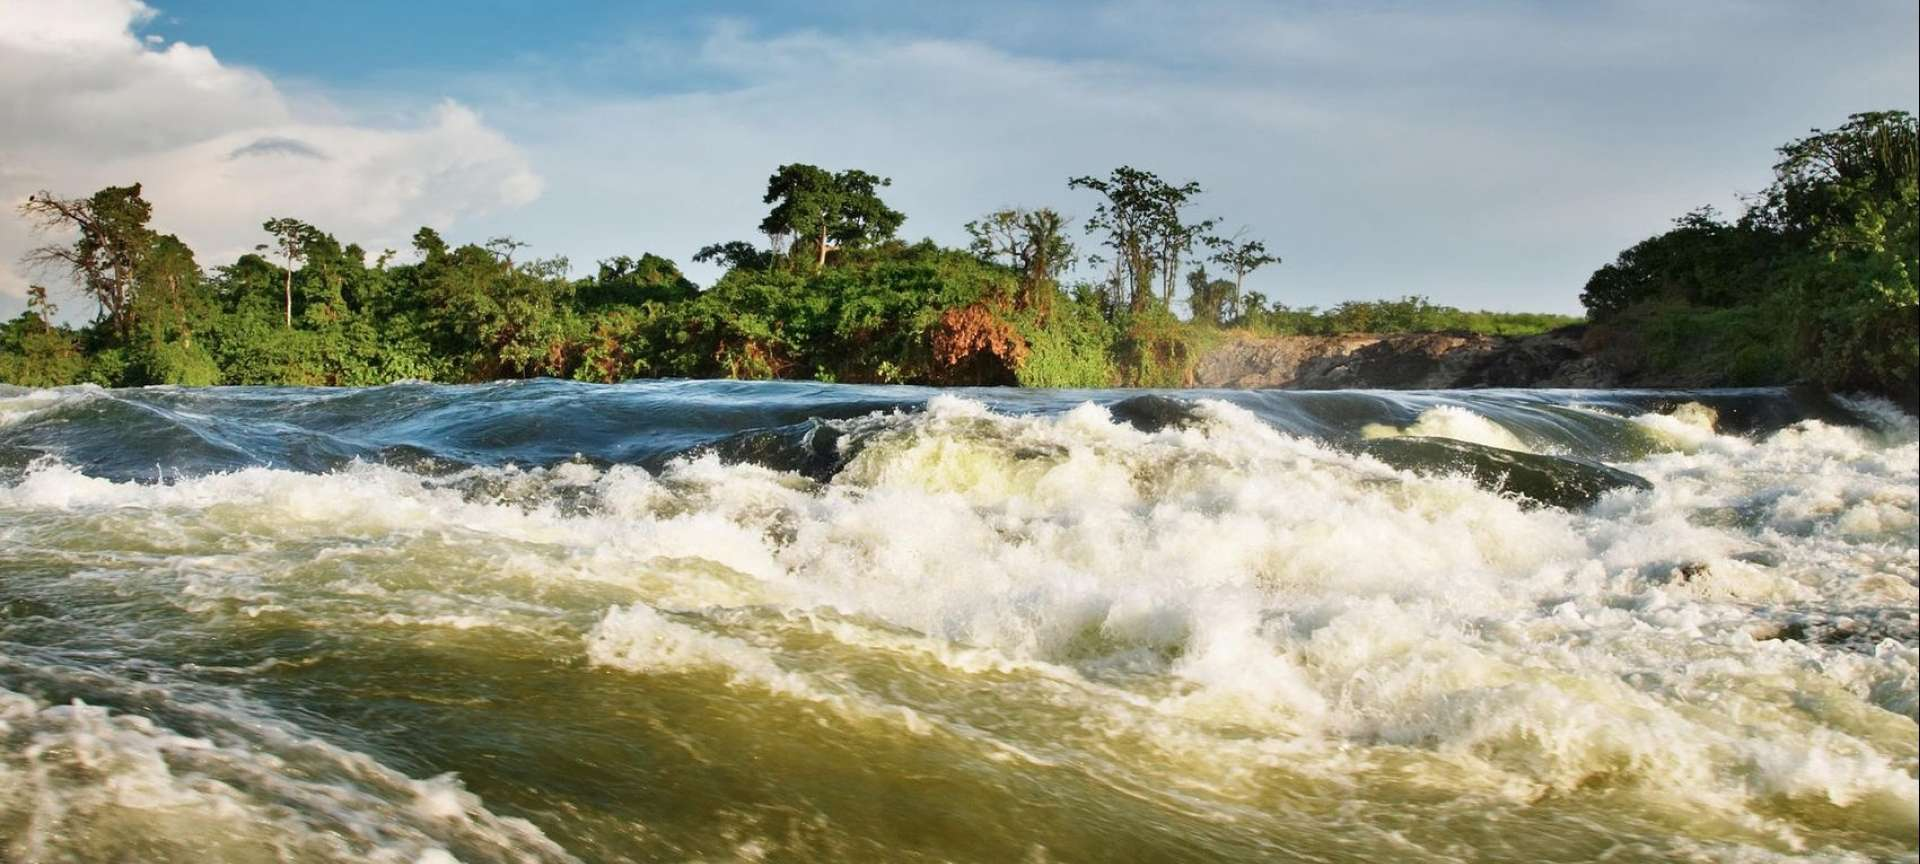 Mount Elgon National Park - Africa Wildlife Safaris